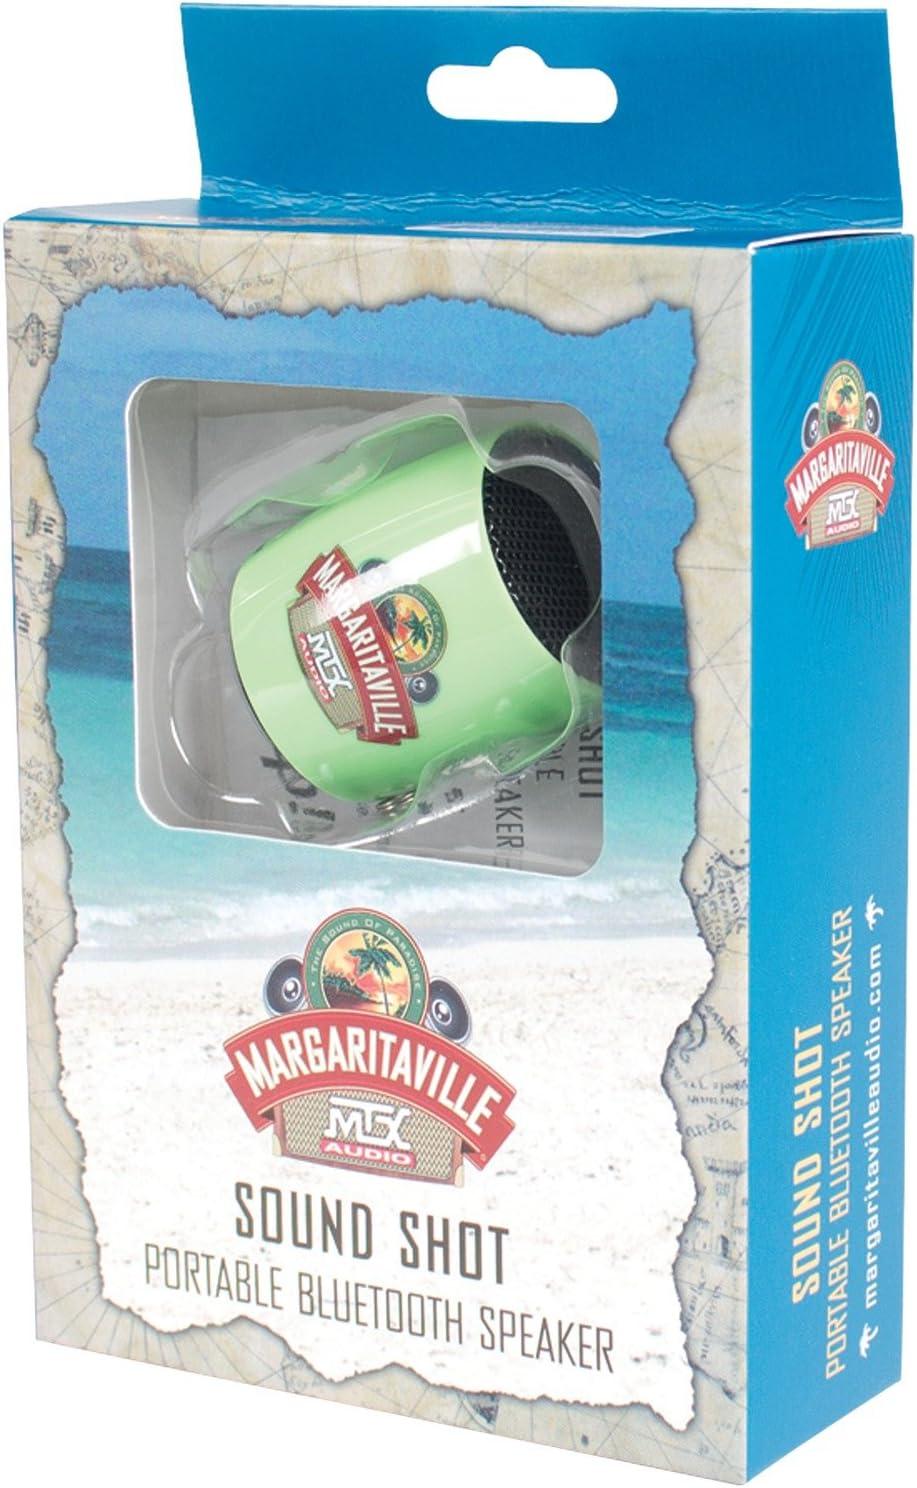 SOUND SHOT Margaritaville Audio by MTX Mini Bluetooth Speaker Green OR Black